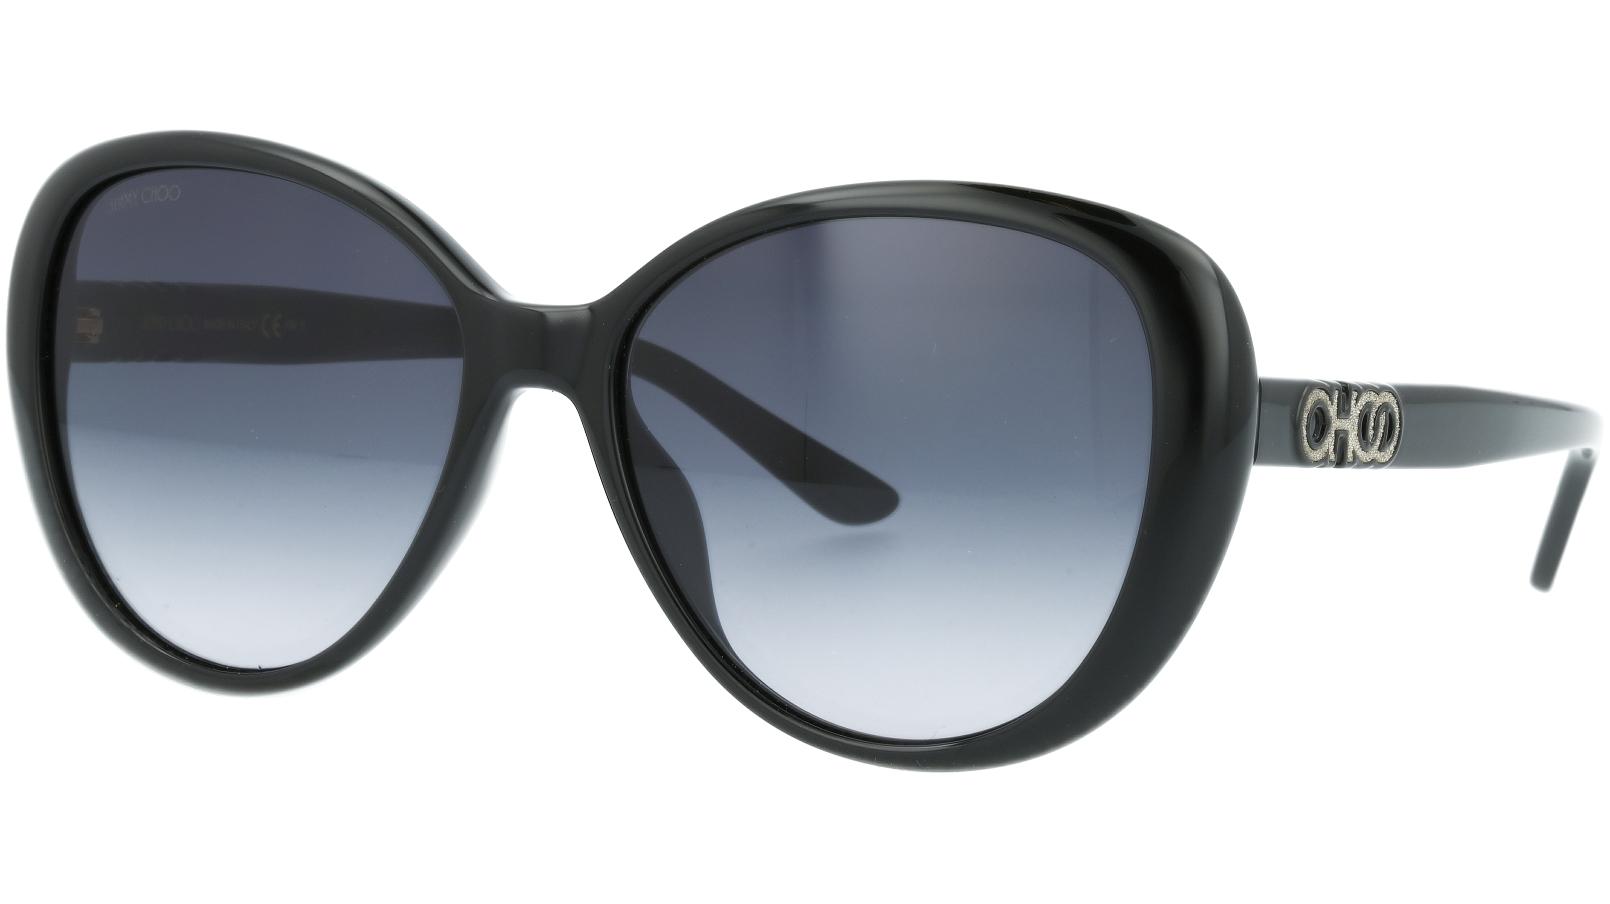 JIMMY CHOO AMIRA/G/S 80790 57 BLACK Sunglasses